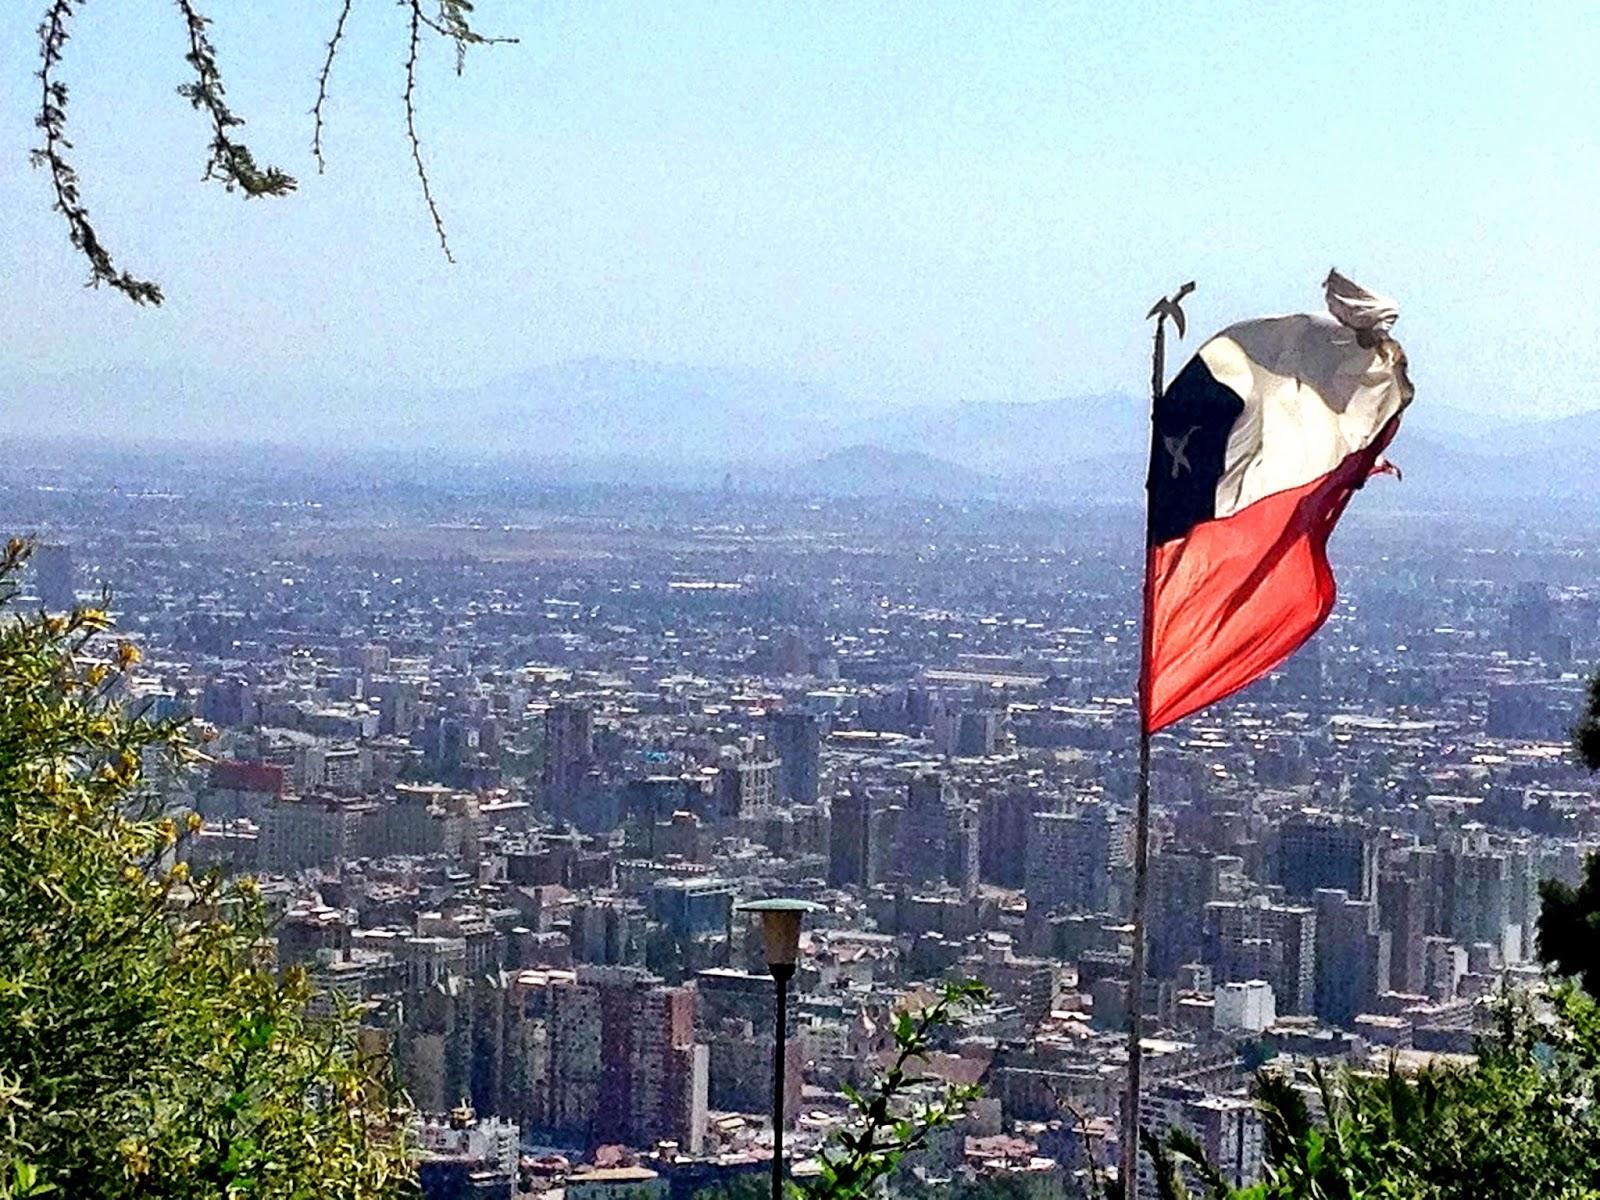 The view from Cerro San Cristobal, Santiago